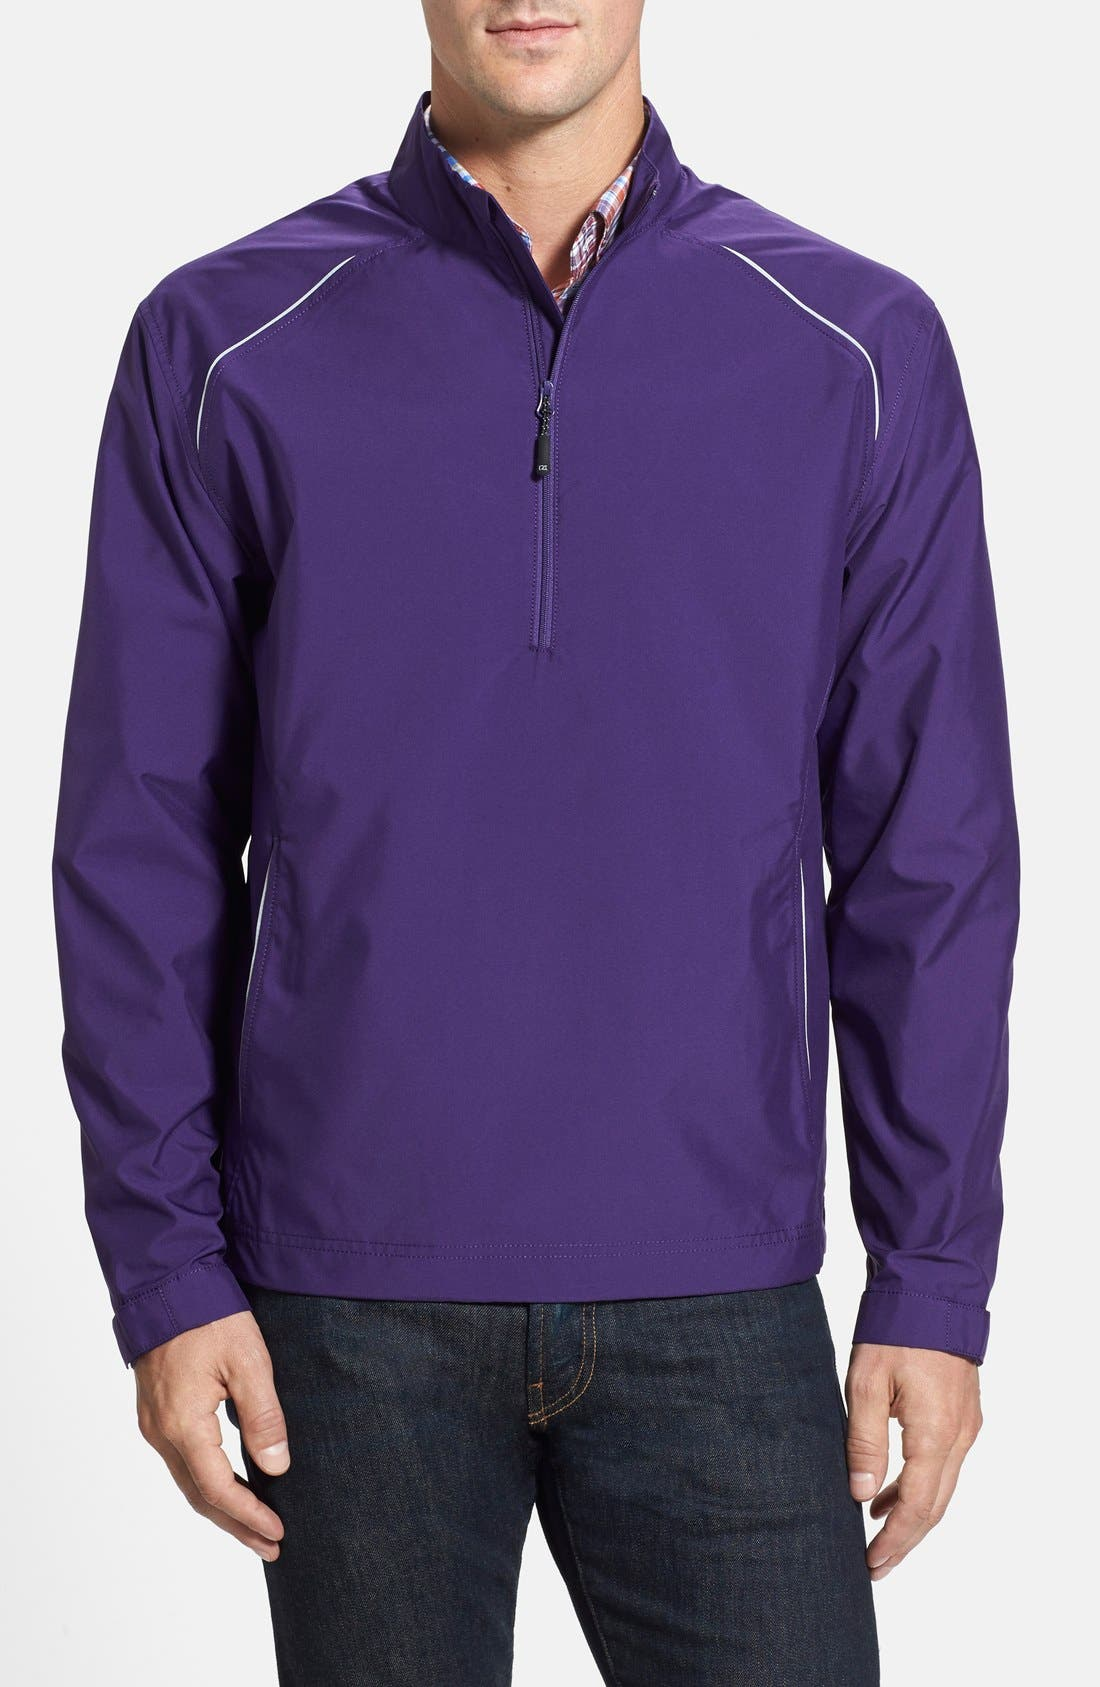 Alternate Image 1 Selected - Cutter & Buck 'Beacon' WeatherTec Wind & Water Resistant Jacket